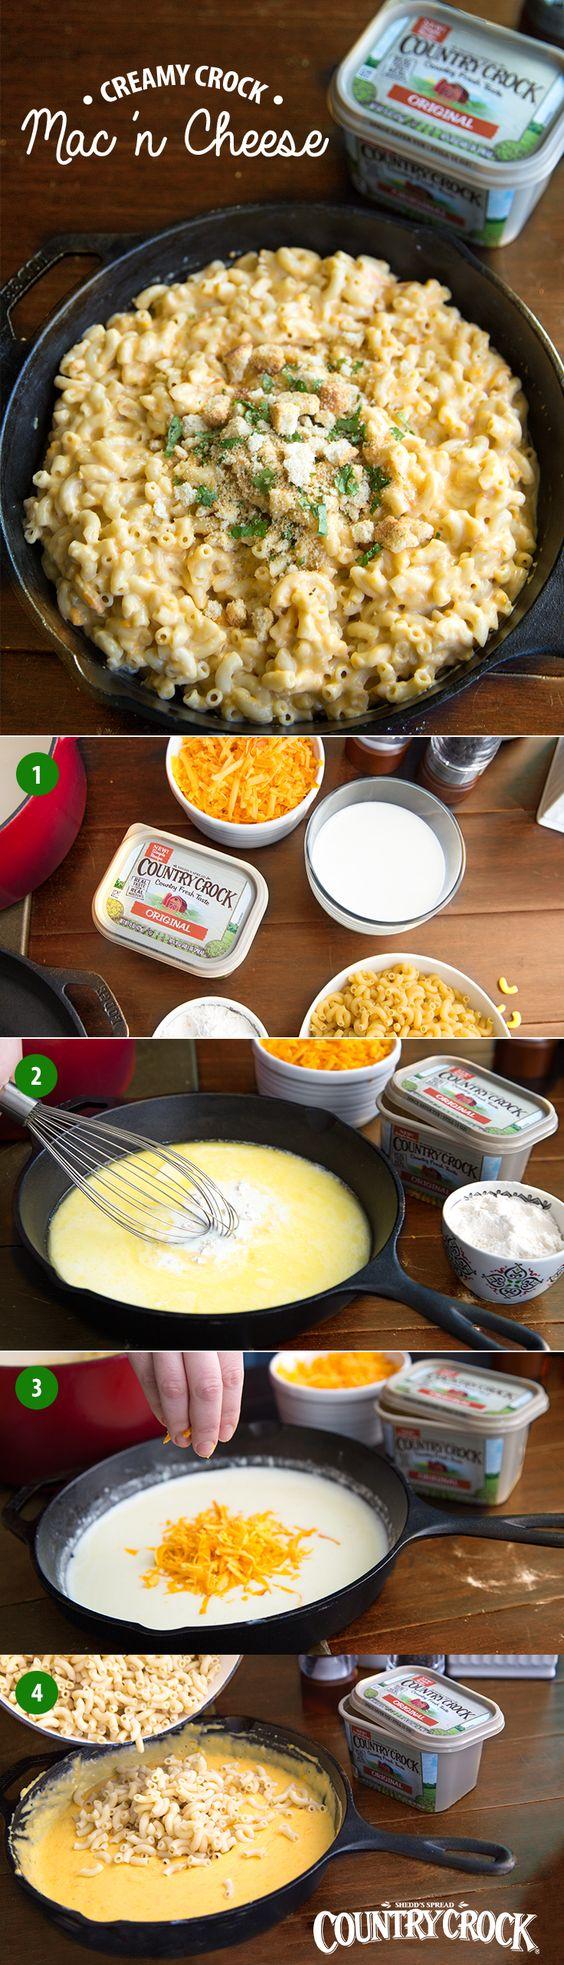 how to make perfect kraft mac and cheese